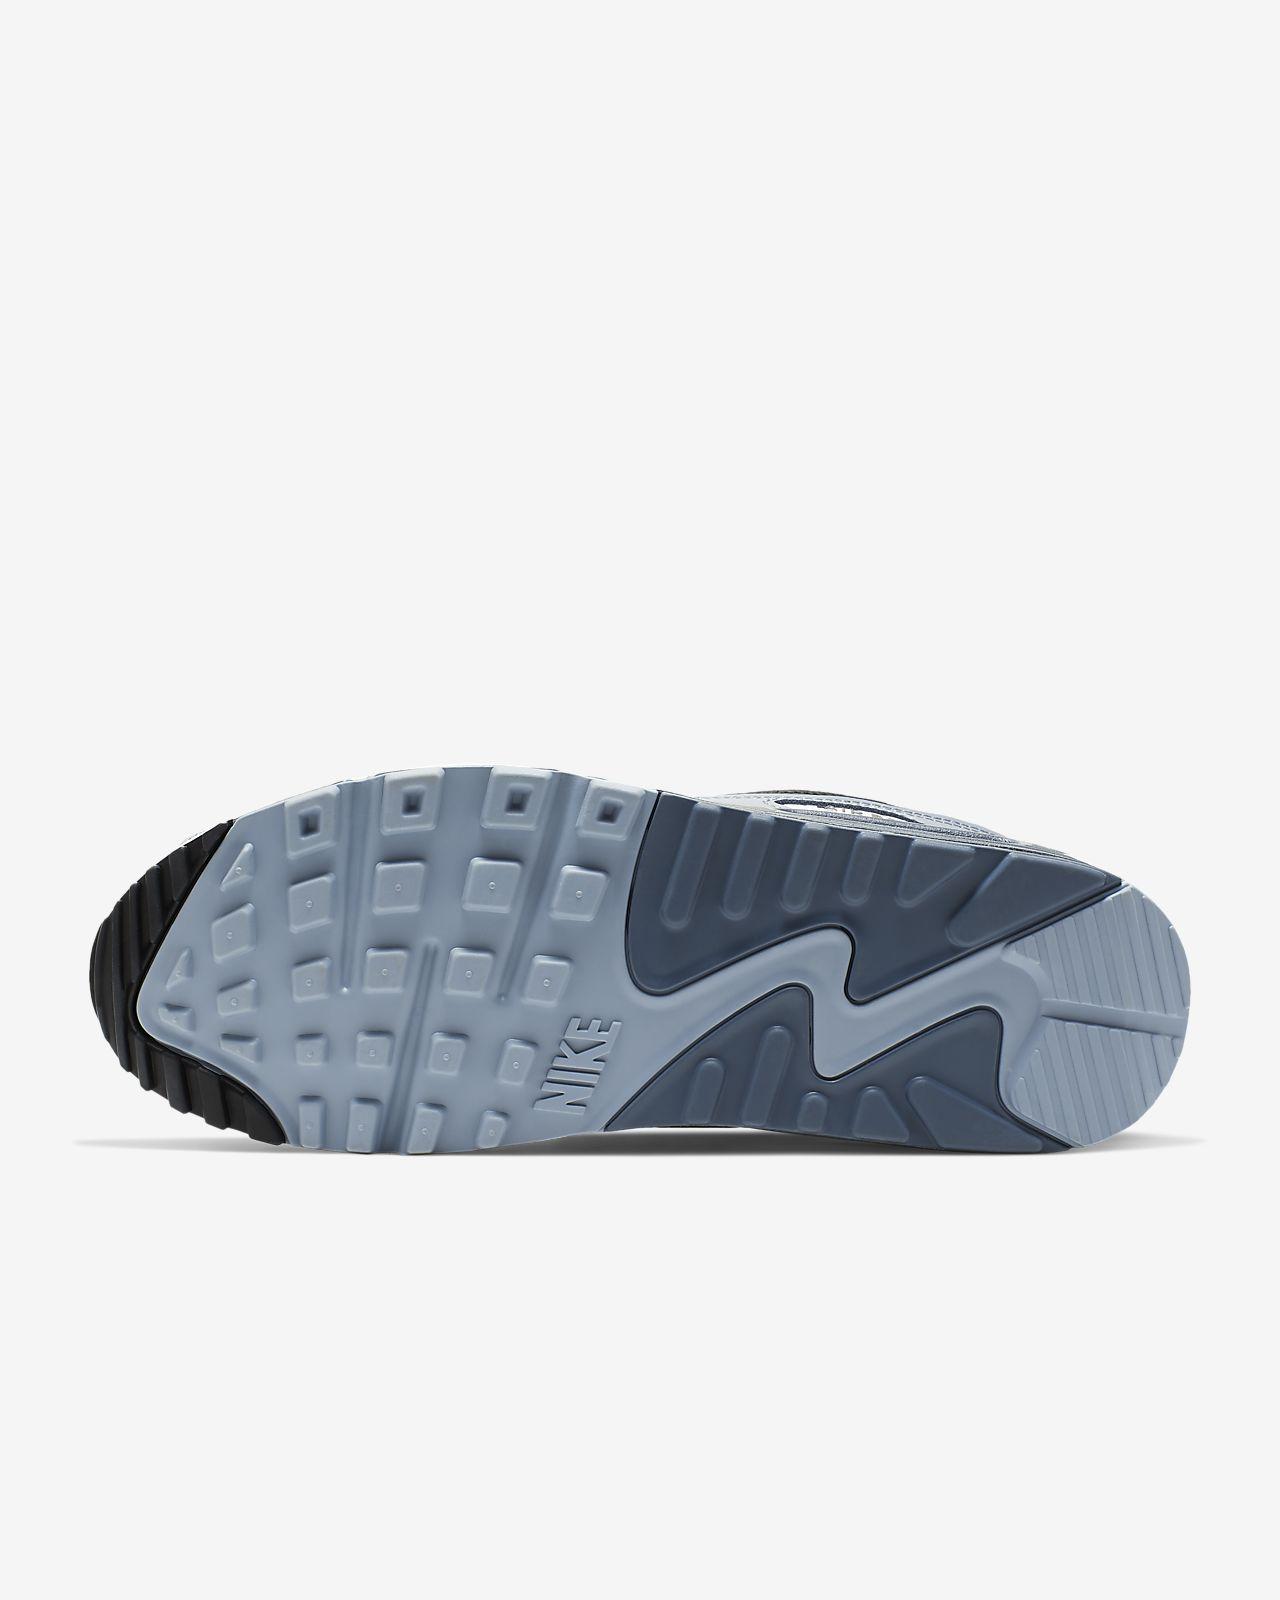 buy online b20fc 518cf ... Scarpa Nike Air Max 90 Essential - Uomo